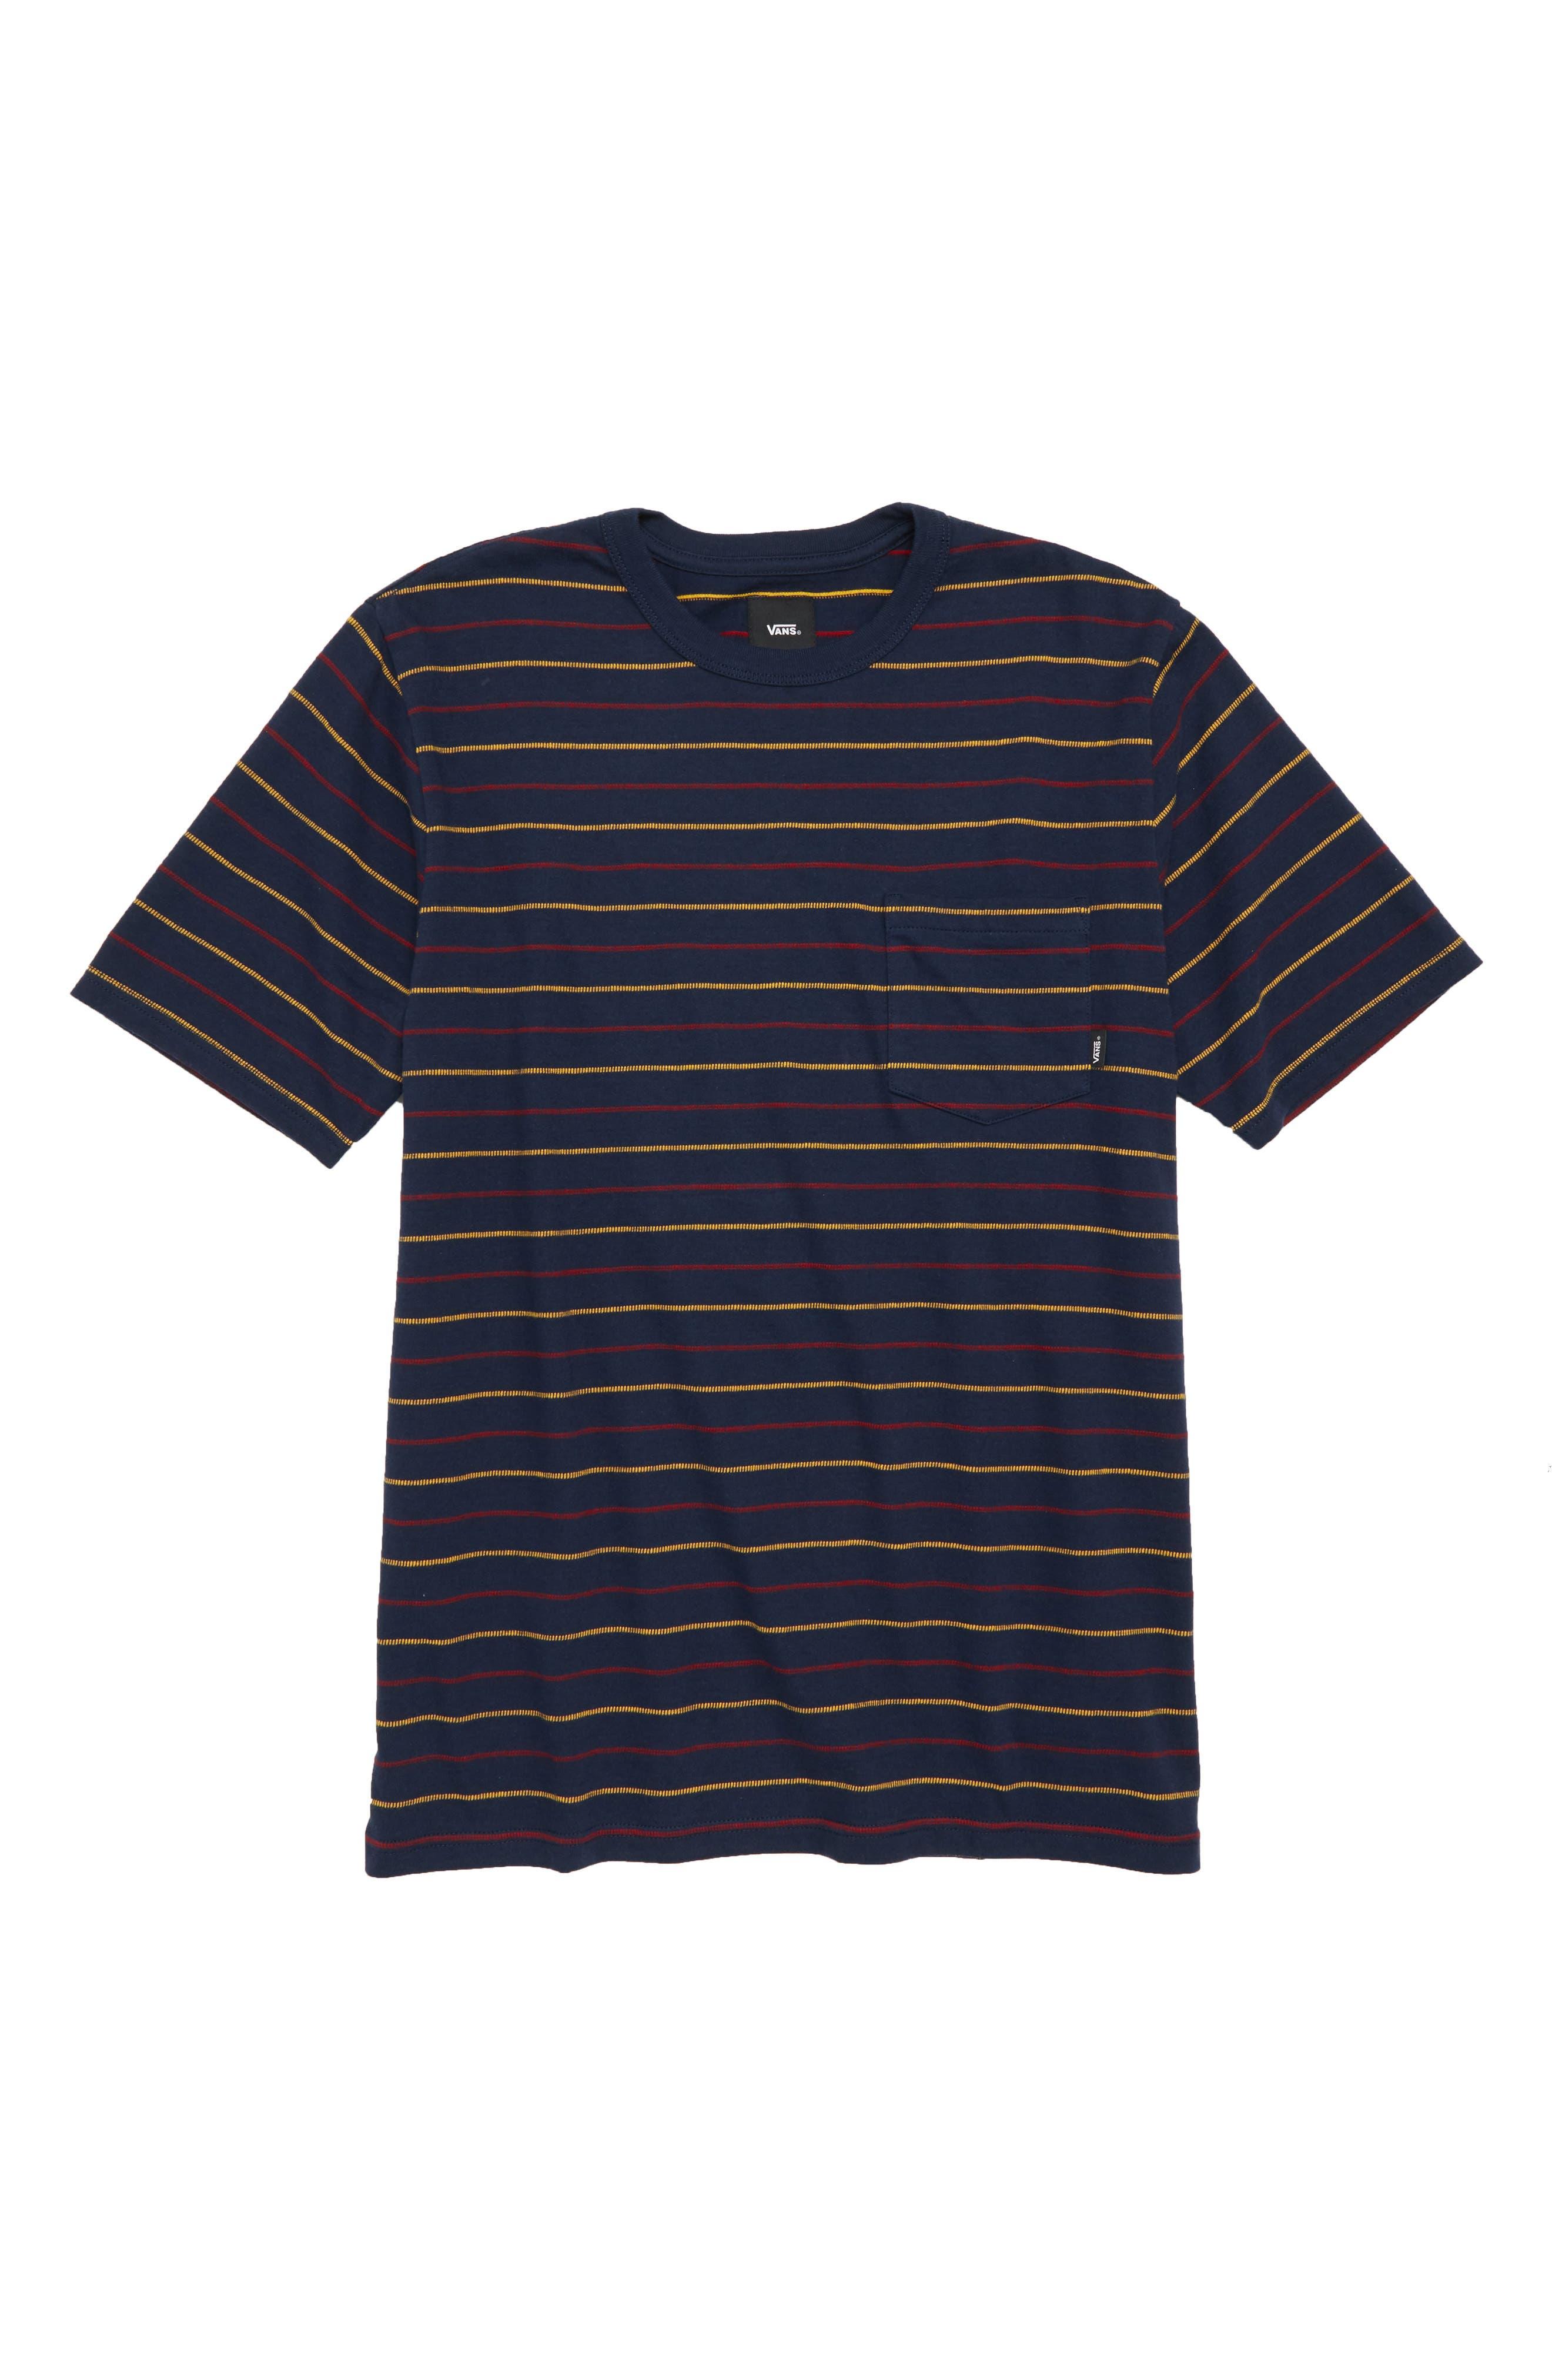 Strikemont III T-Shirt,                         Main,                         color, Dress Blues